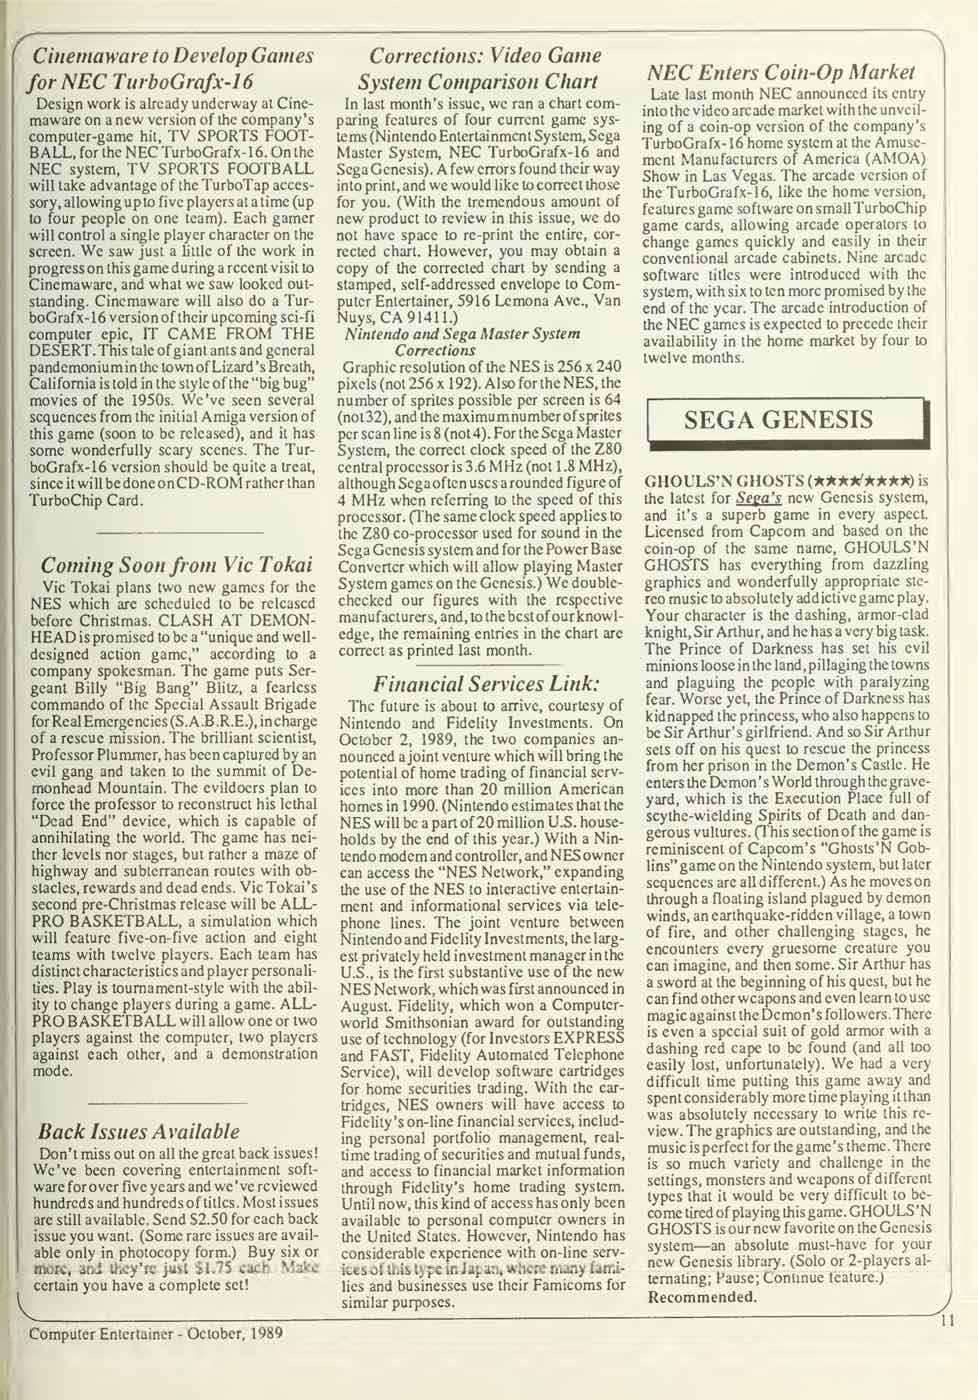 Computer Entertainer | October 1989 p11